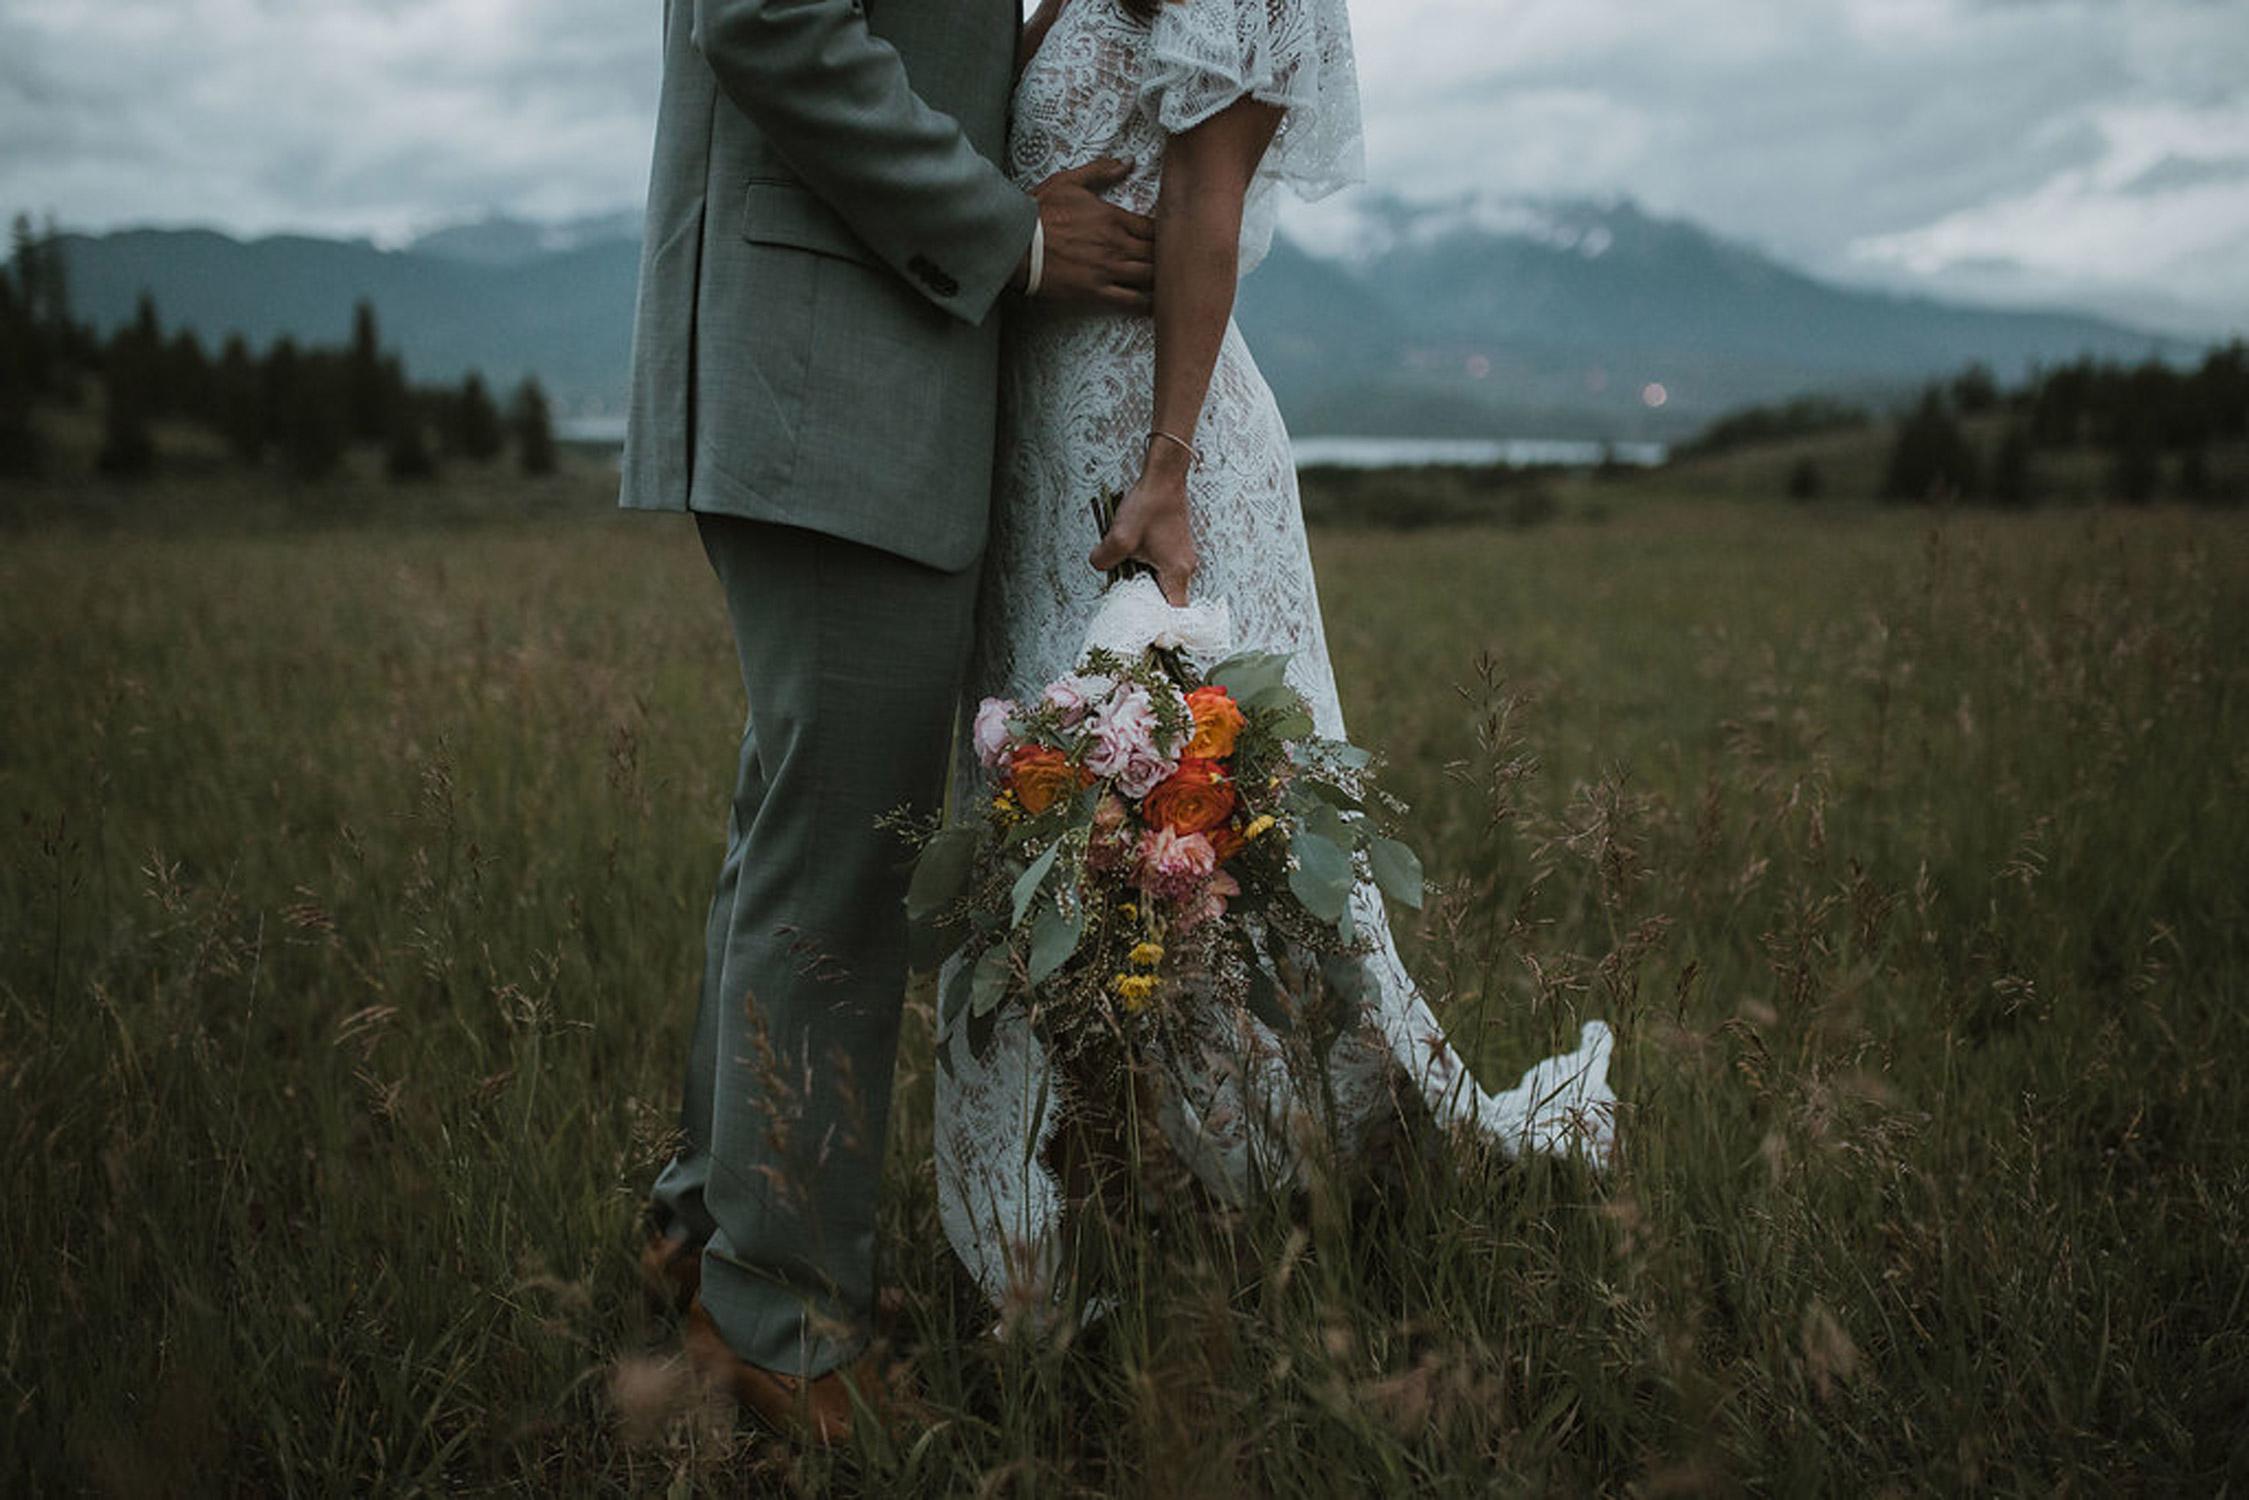 Boho Bride & Groom, hand-tied bouquet - fresh flowers